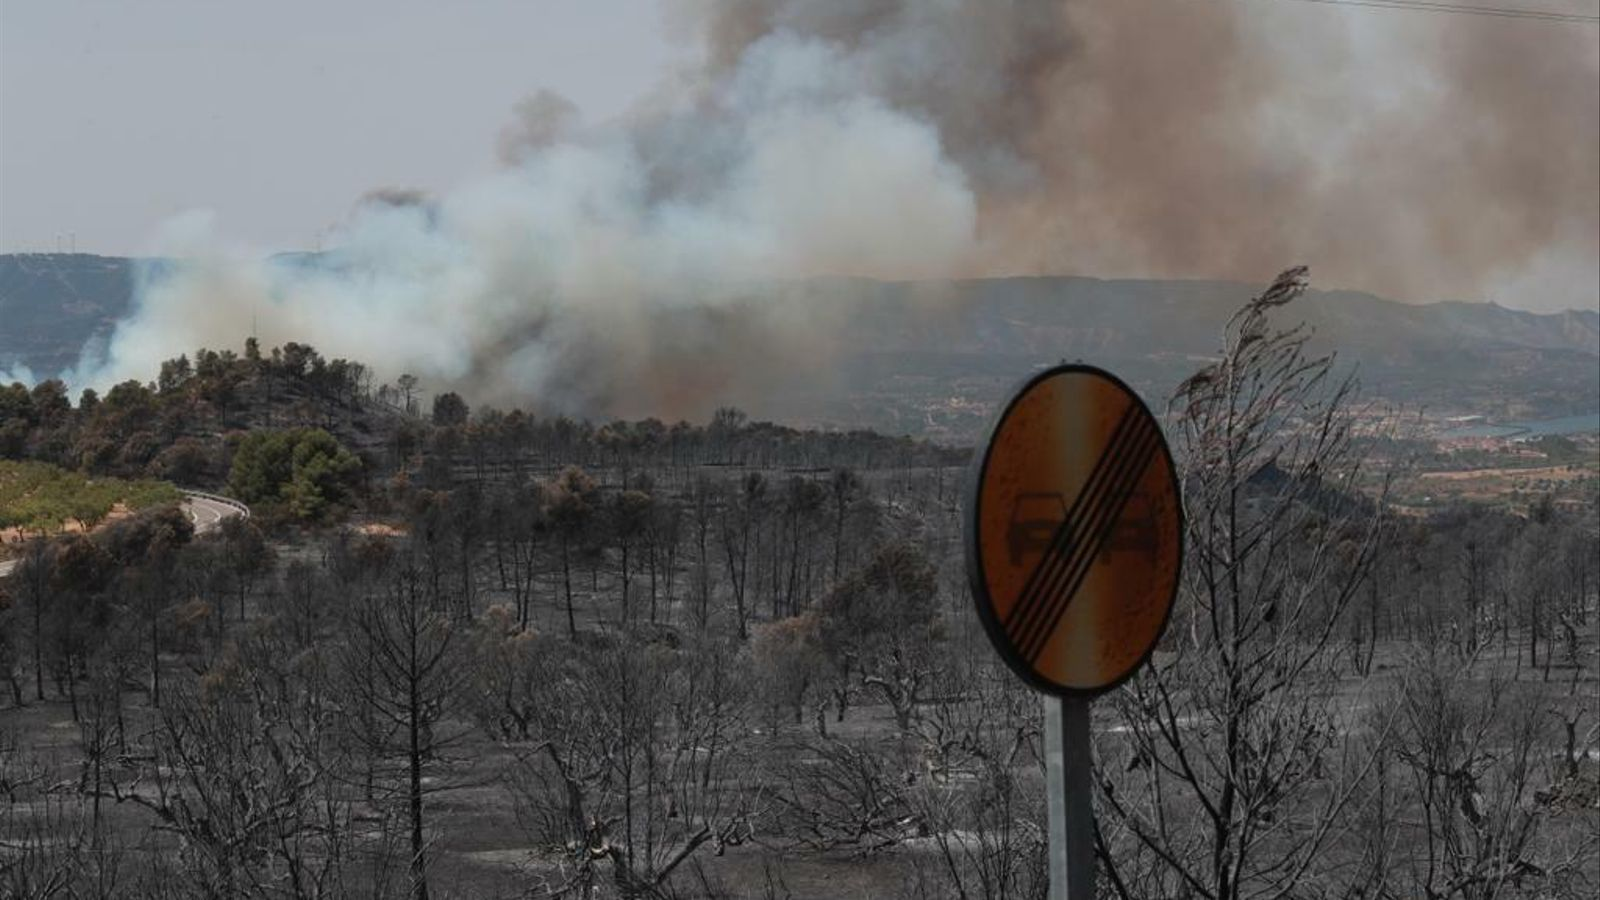 La zona arrasada pel foc / TJERK VAN DER MEULEN